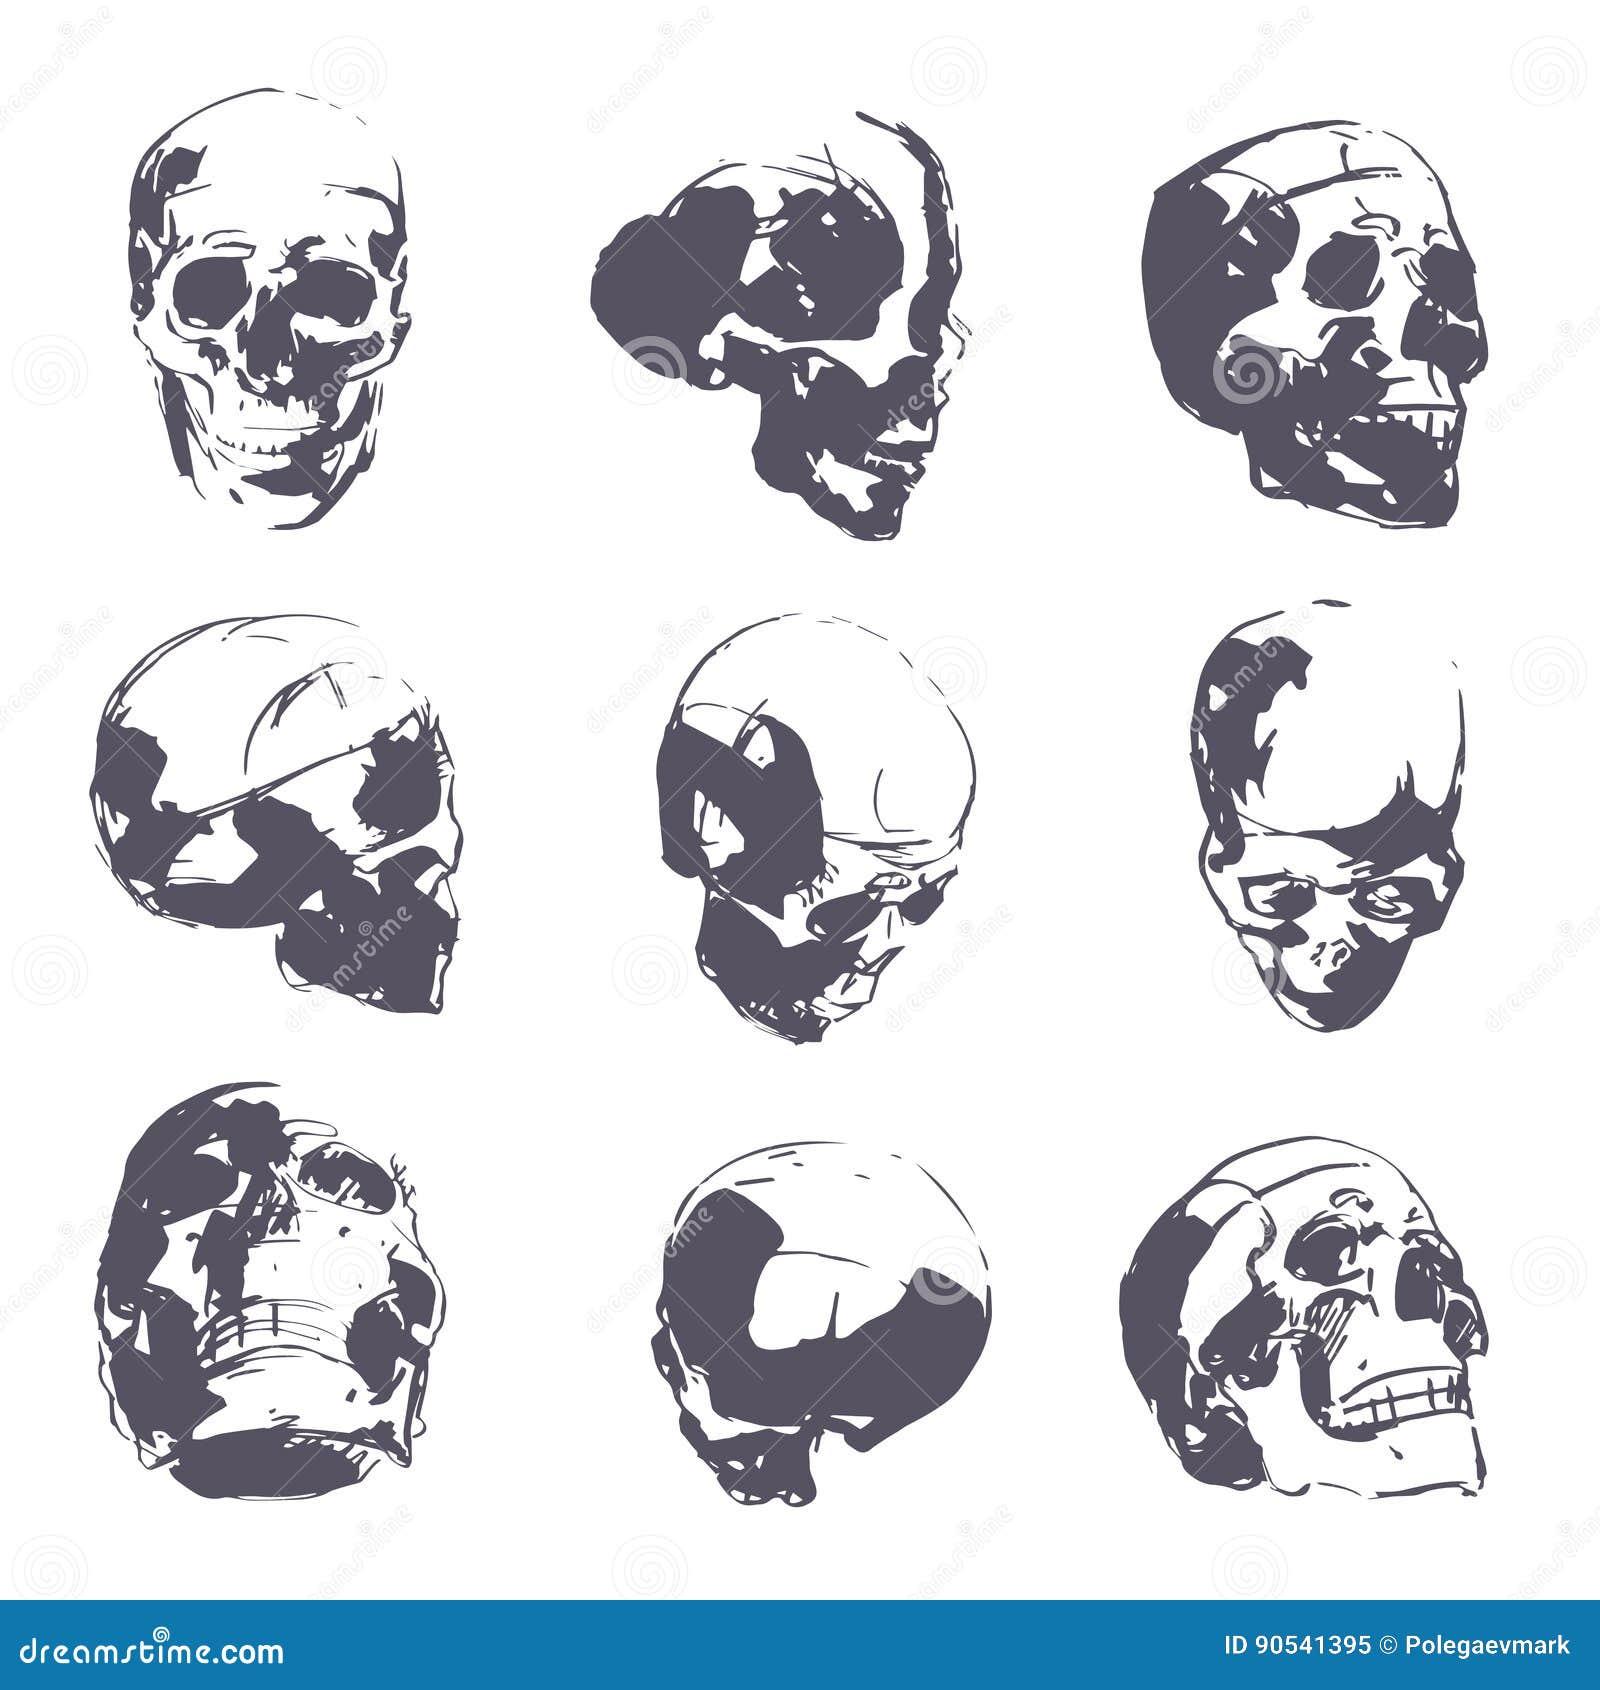 human skull in rough sketch man head anatomy hand drawn vector